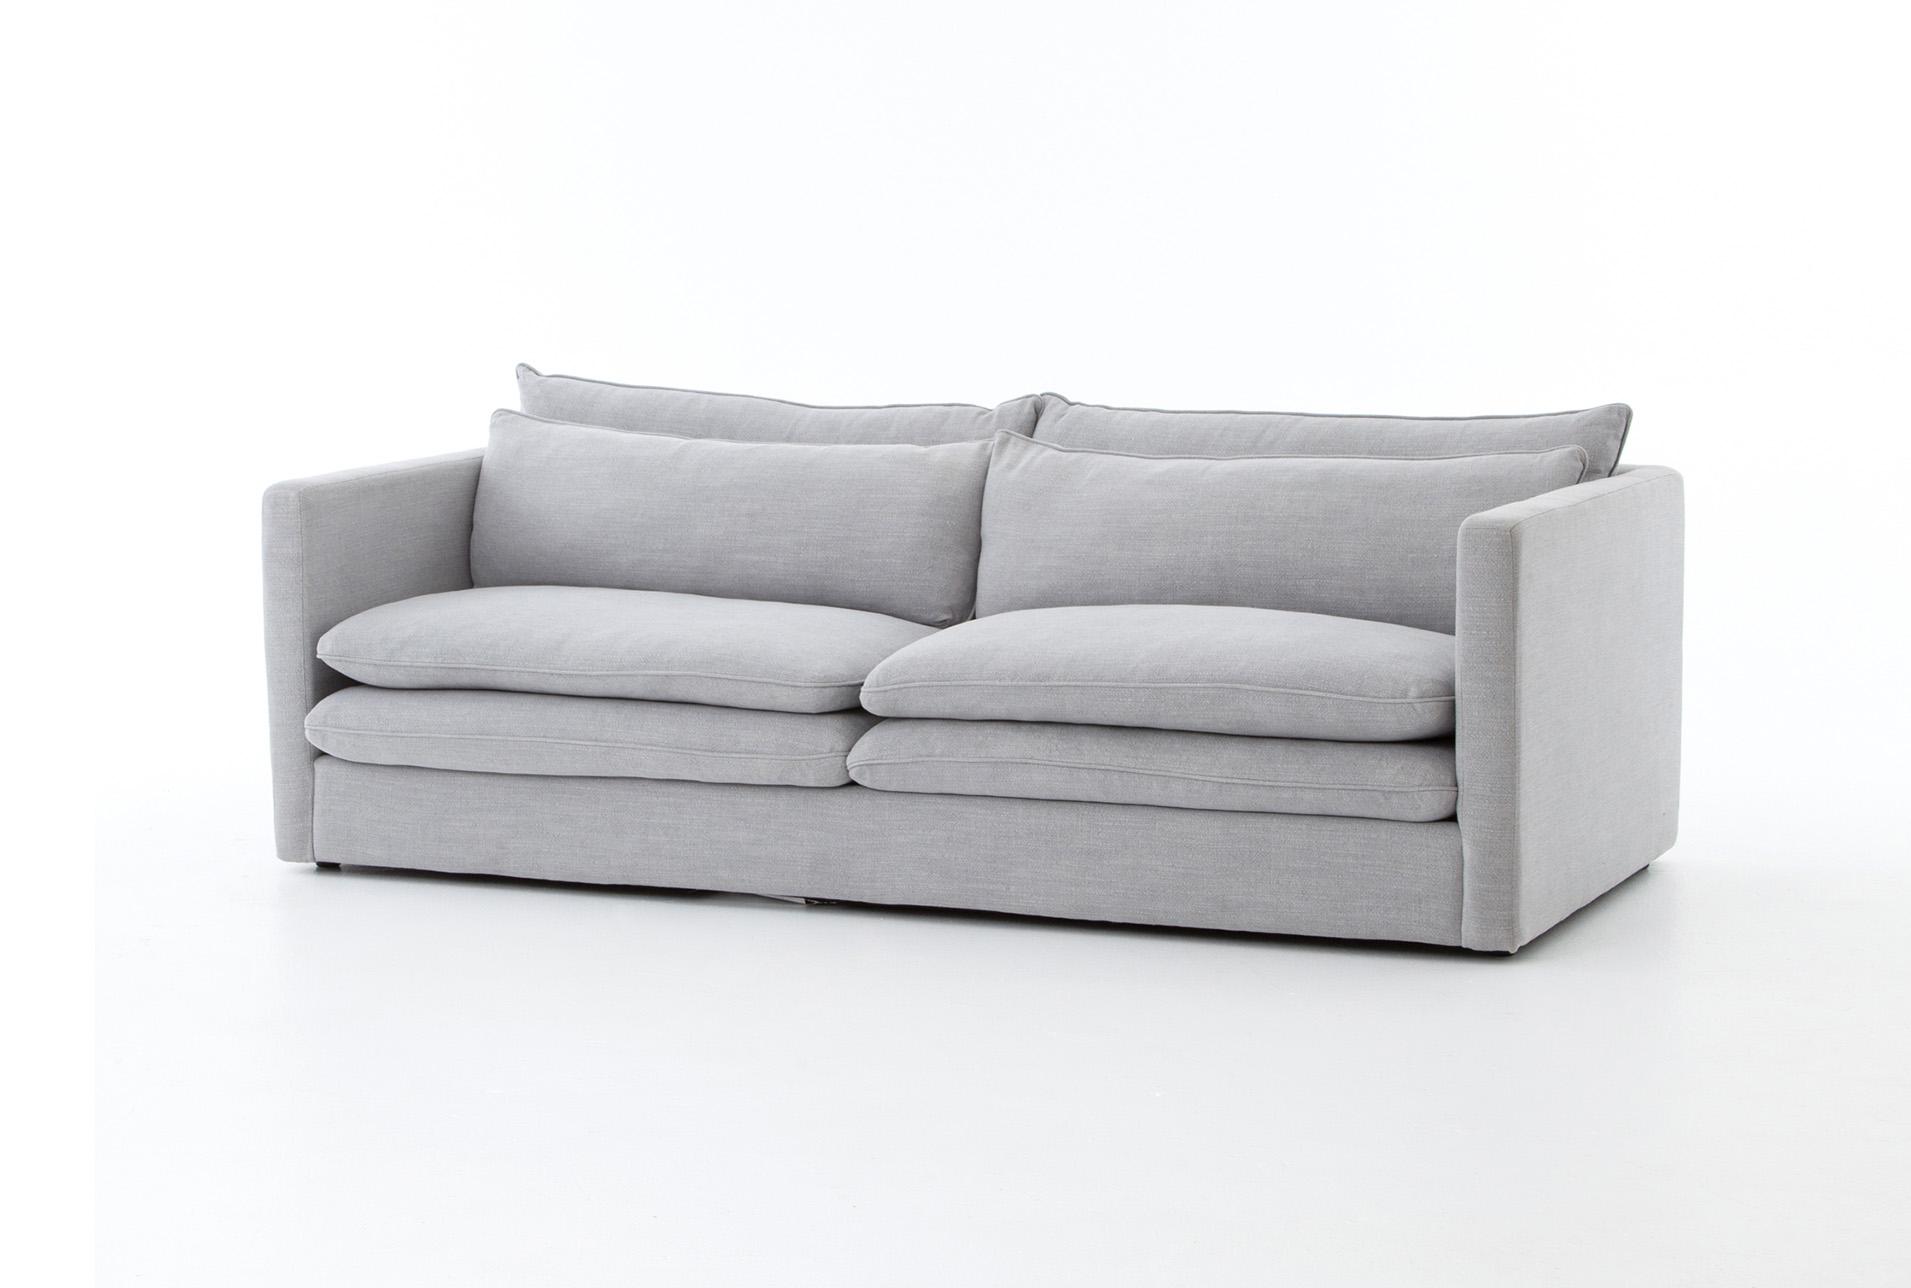 Attractive Poplar U0026 Fabric 84 Inch Sofa   360 Elements